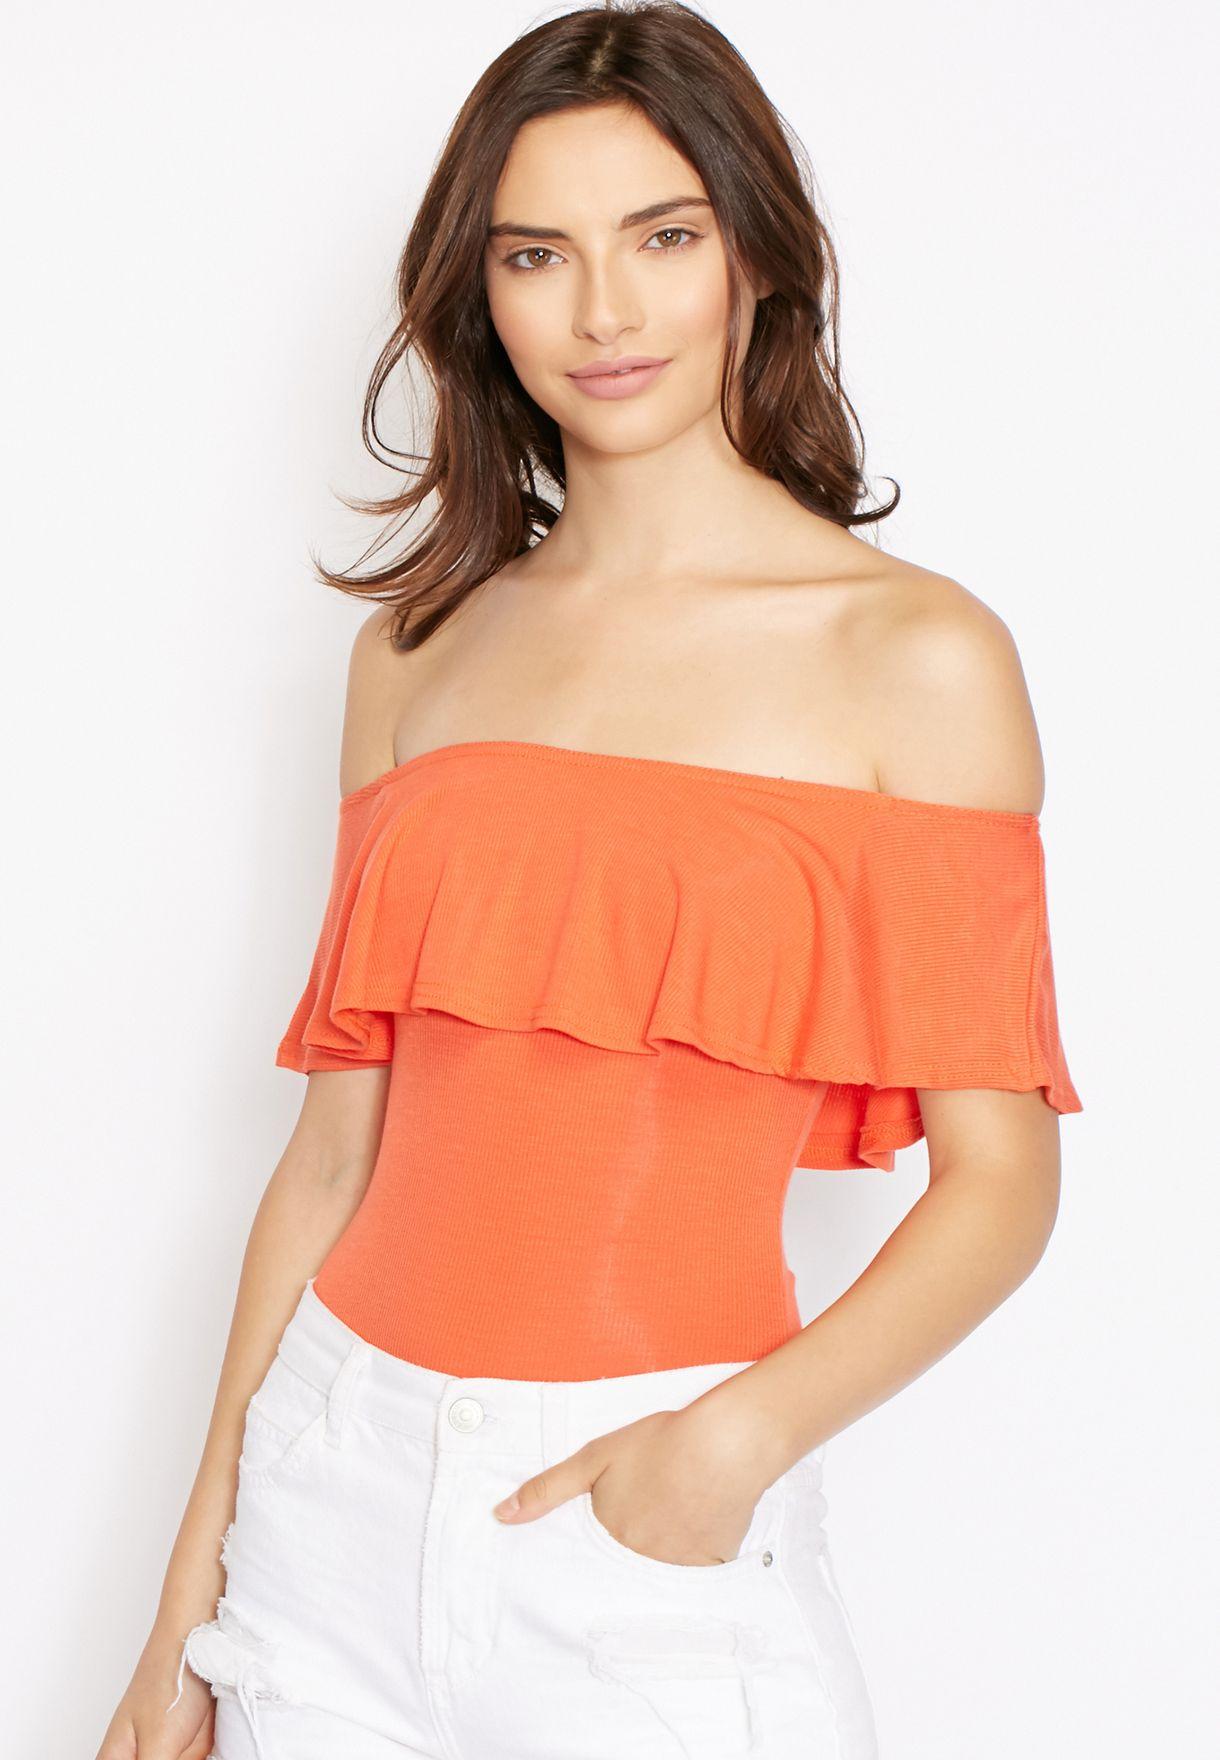 29bbb6d7a1 Shop Missguided orange Ruffled Bardot Body for Women in Qatar - MI669AT50ZOZ